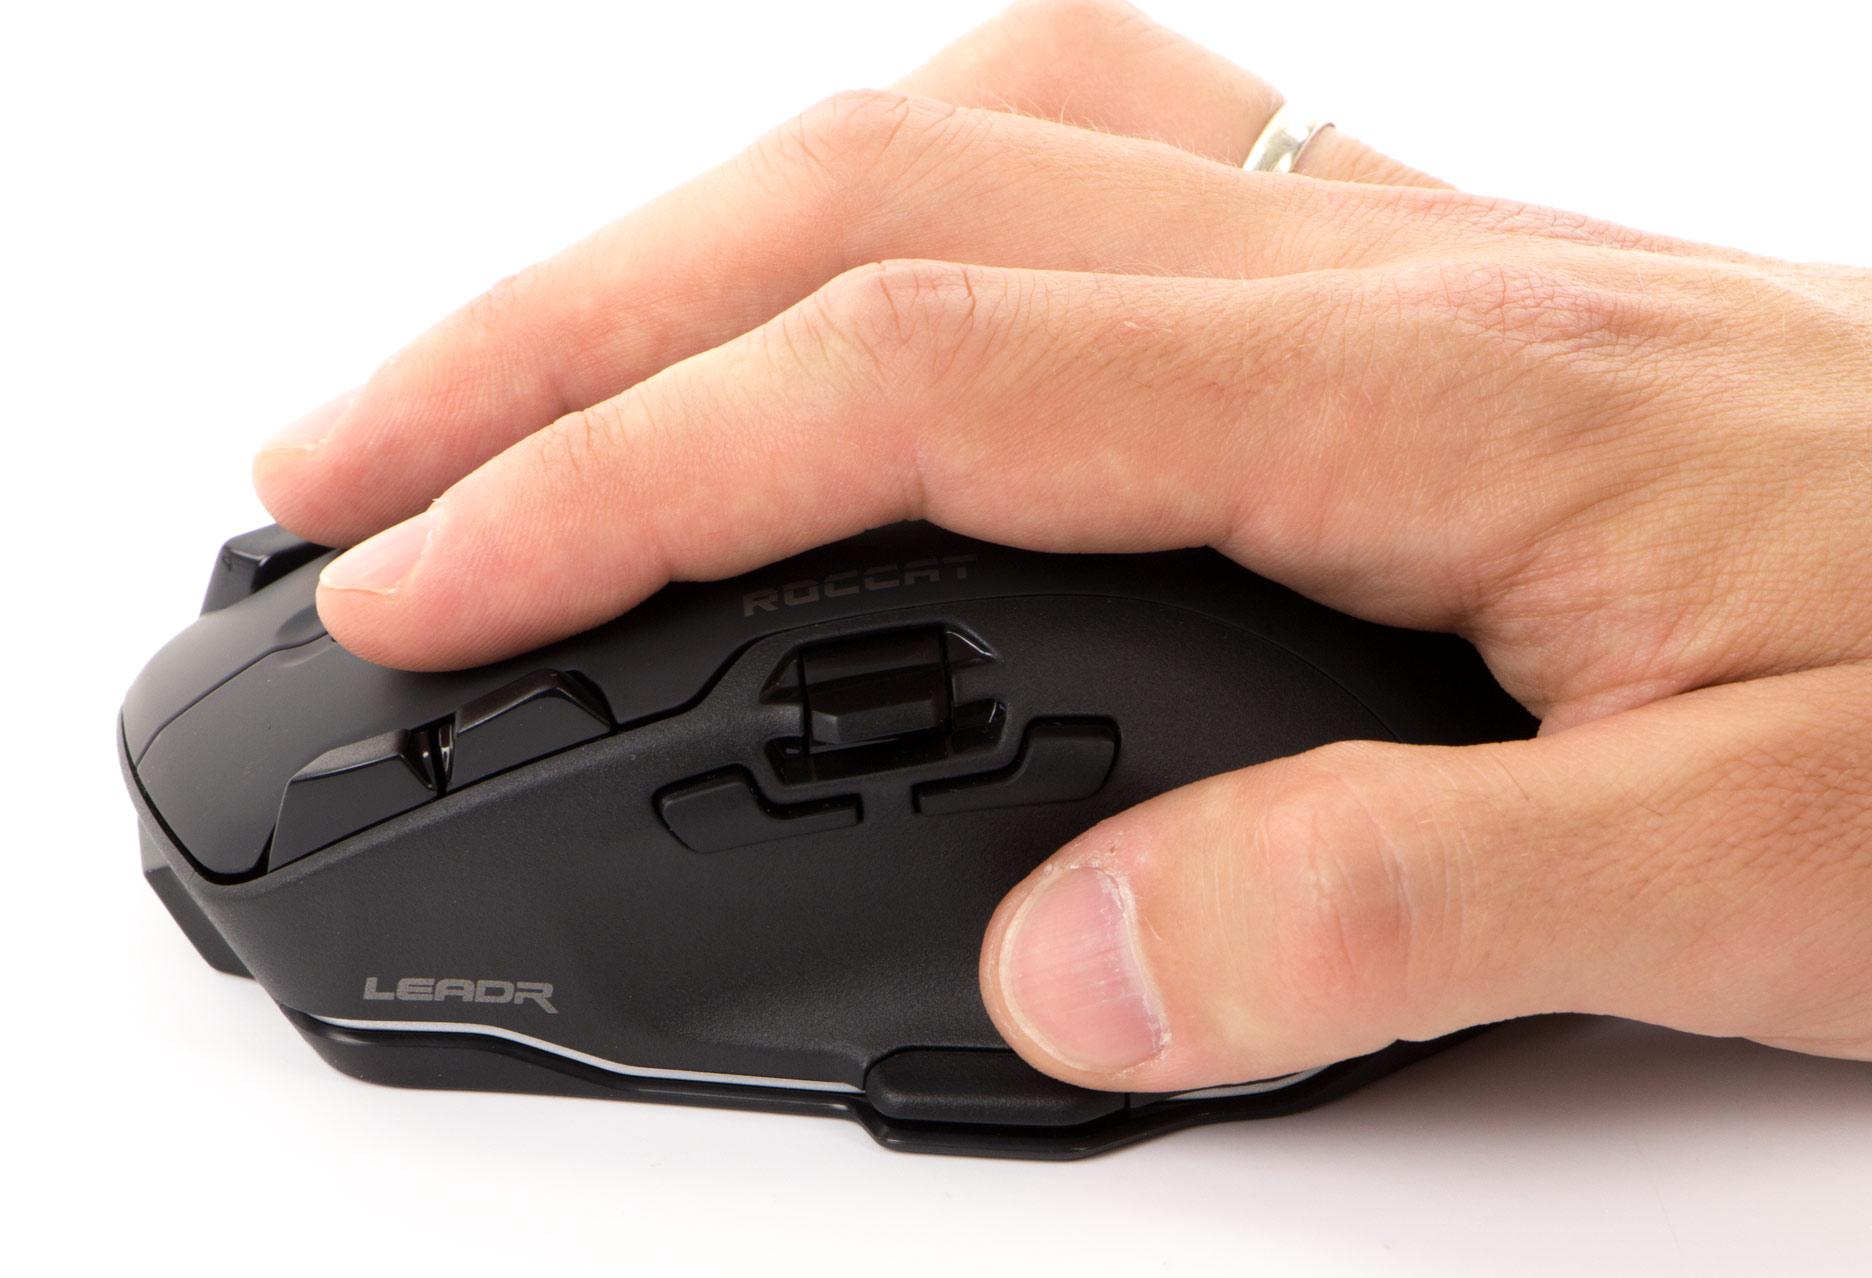 Roccat Leadr - dłoń leży na myszy